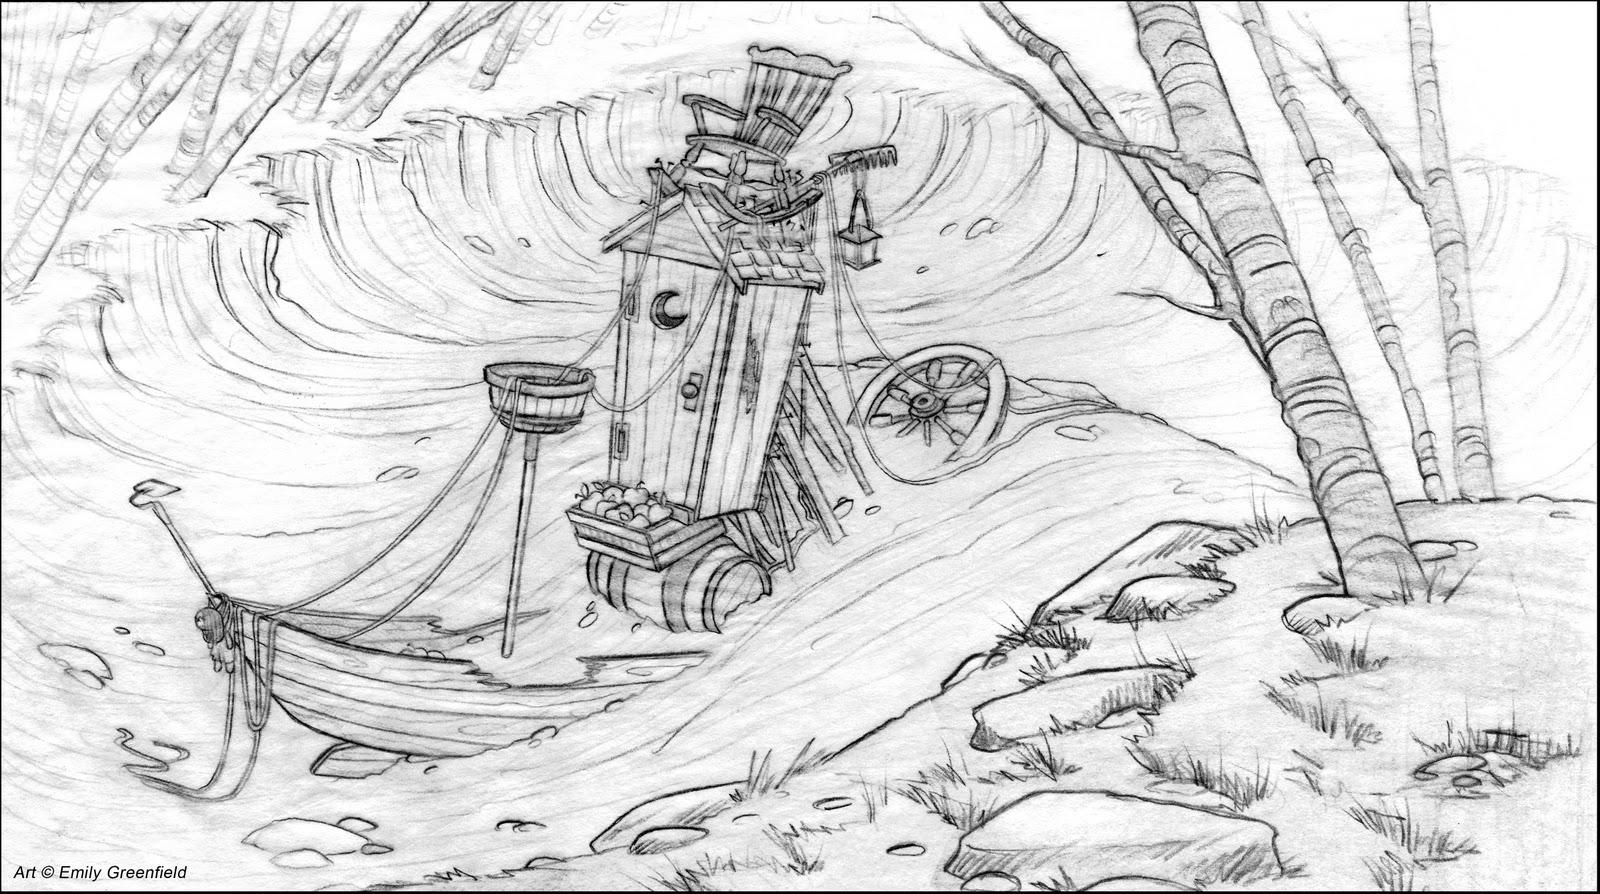 Sensational Emilys Sketchblog Final Pirate Ship Layout Wiring 101 Cominwise Assnl